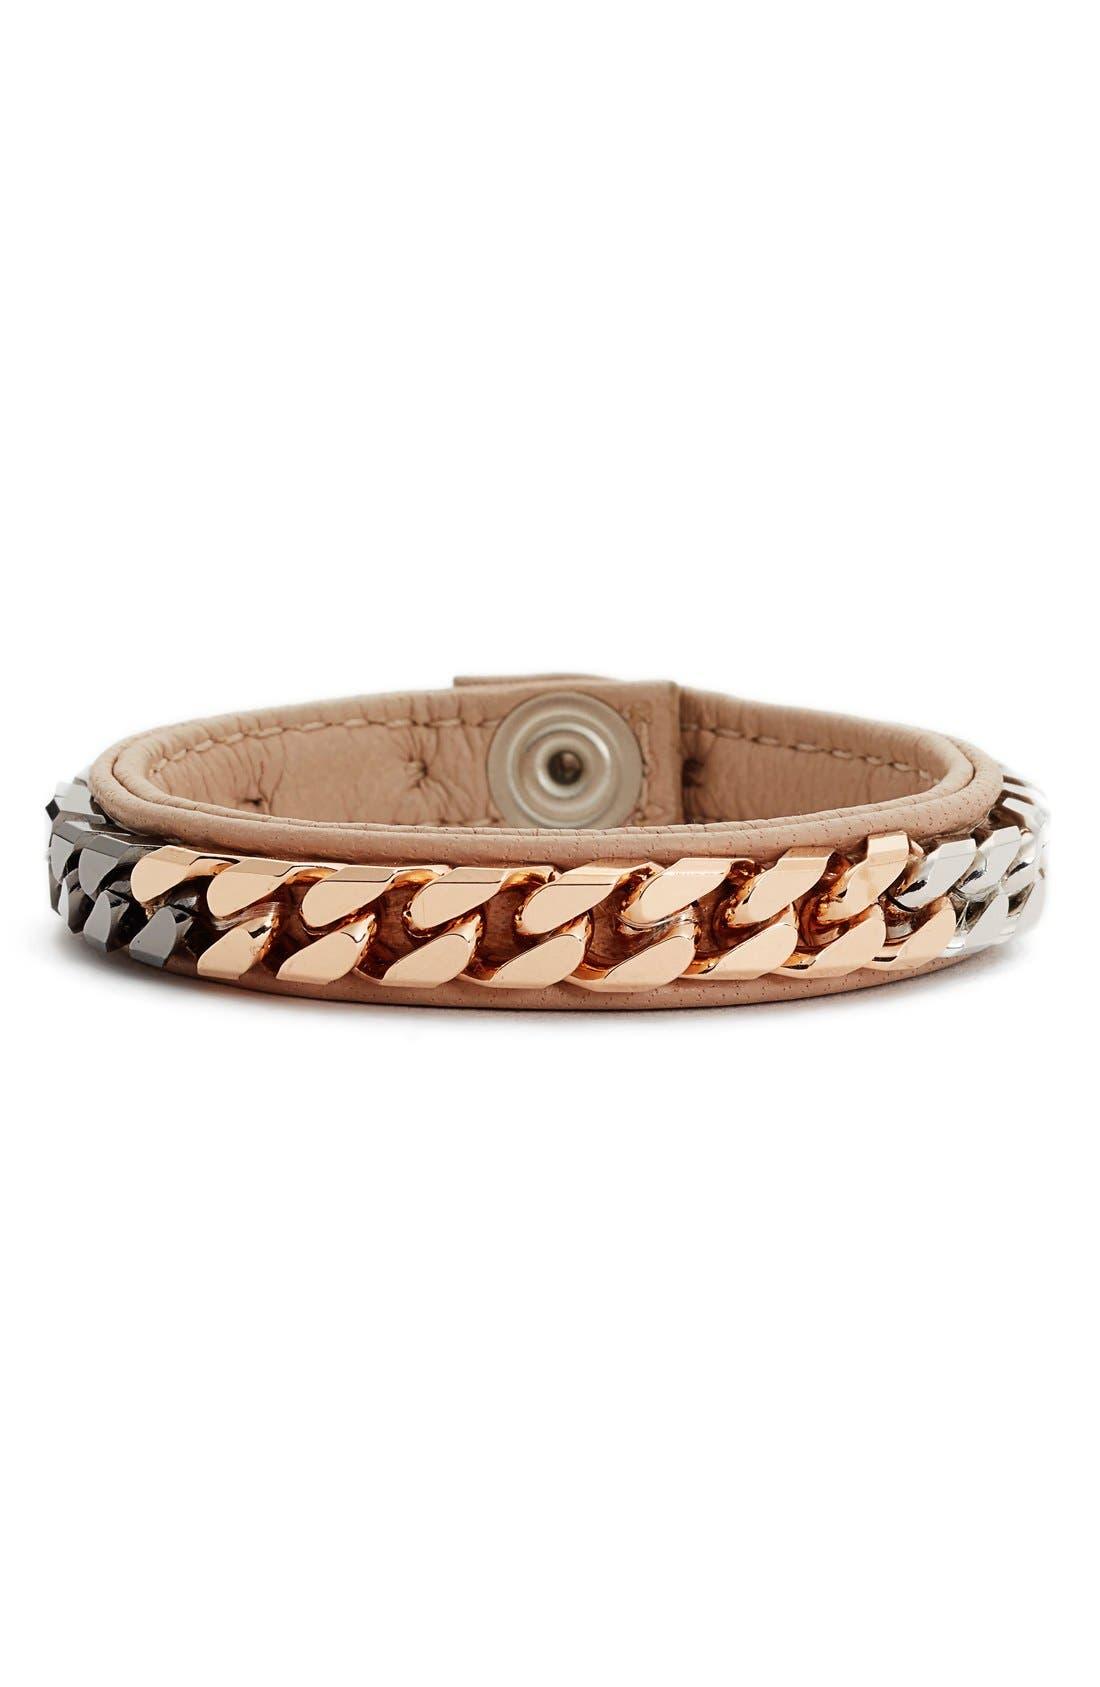 Monaco Wrap Bracelet,                         Main,                         color, Nude / Multi Chain